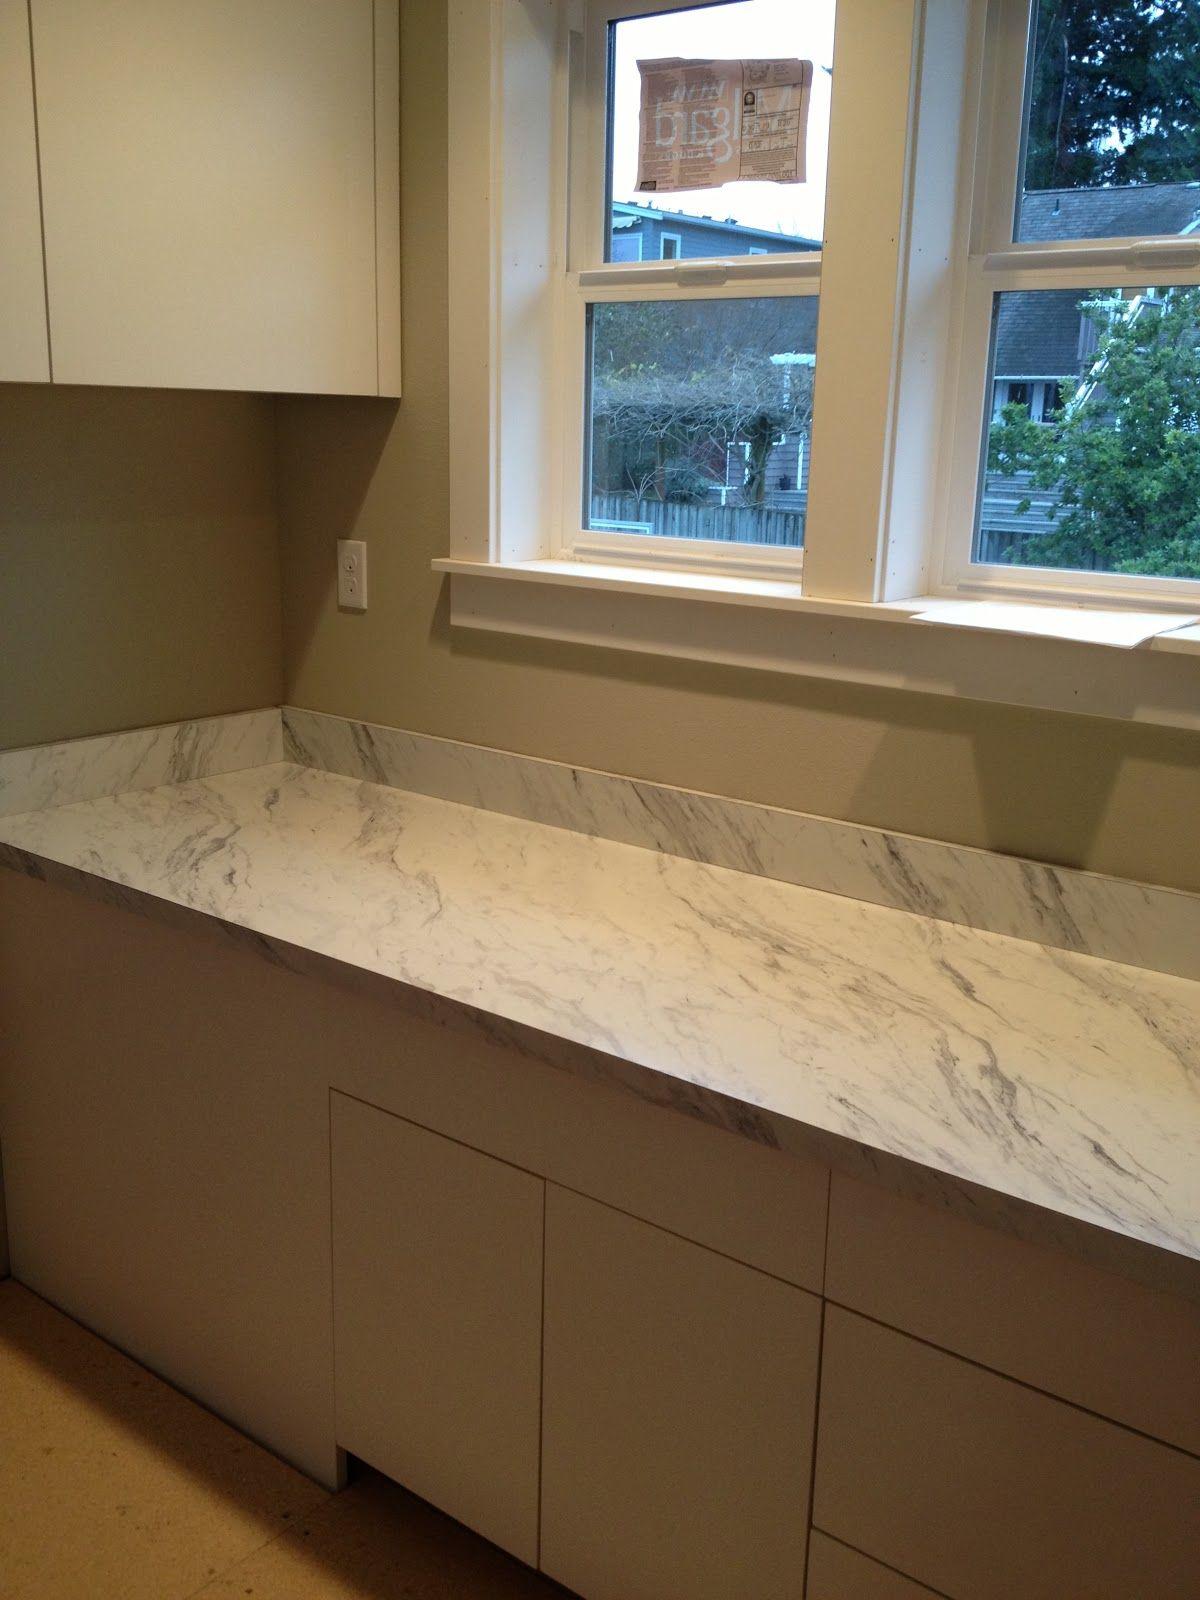 Top 15 Kitchen Remodel Ideas And Costs 2019 Update: WilsonArt Calcutta Marble